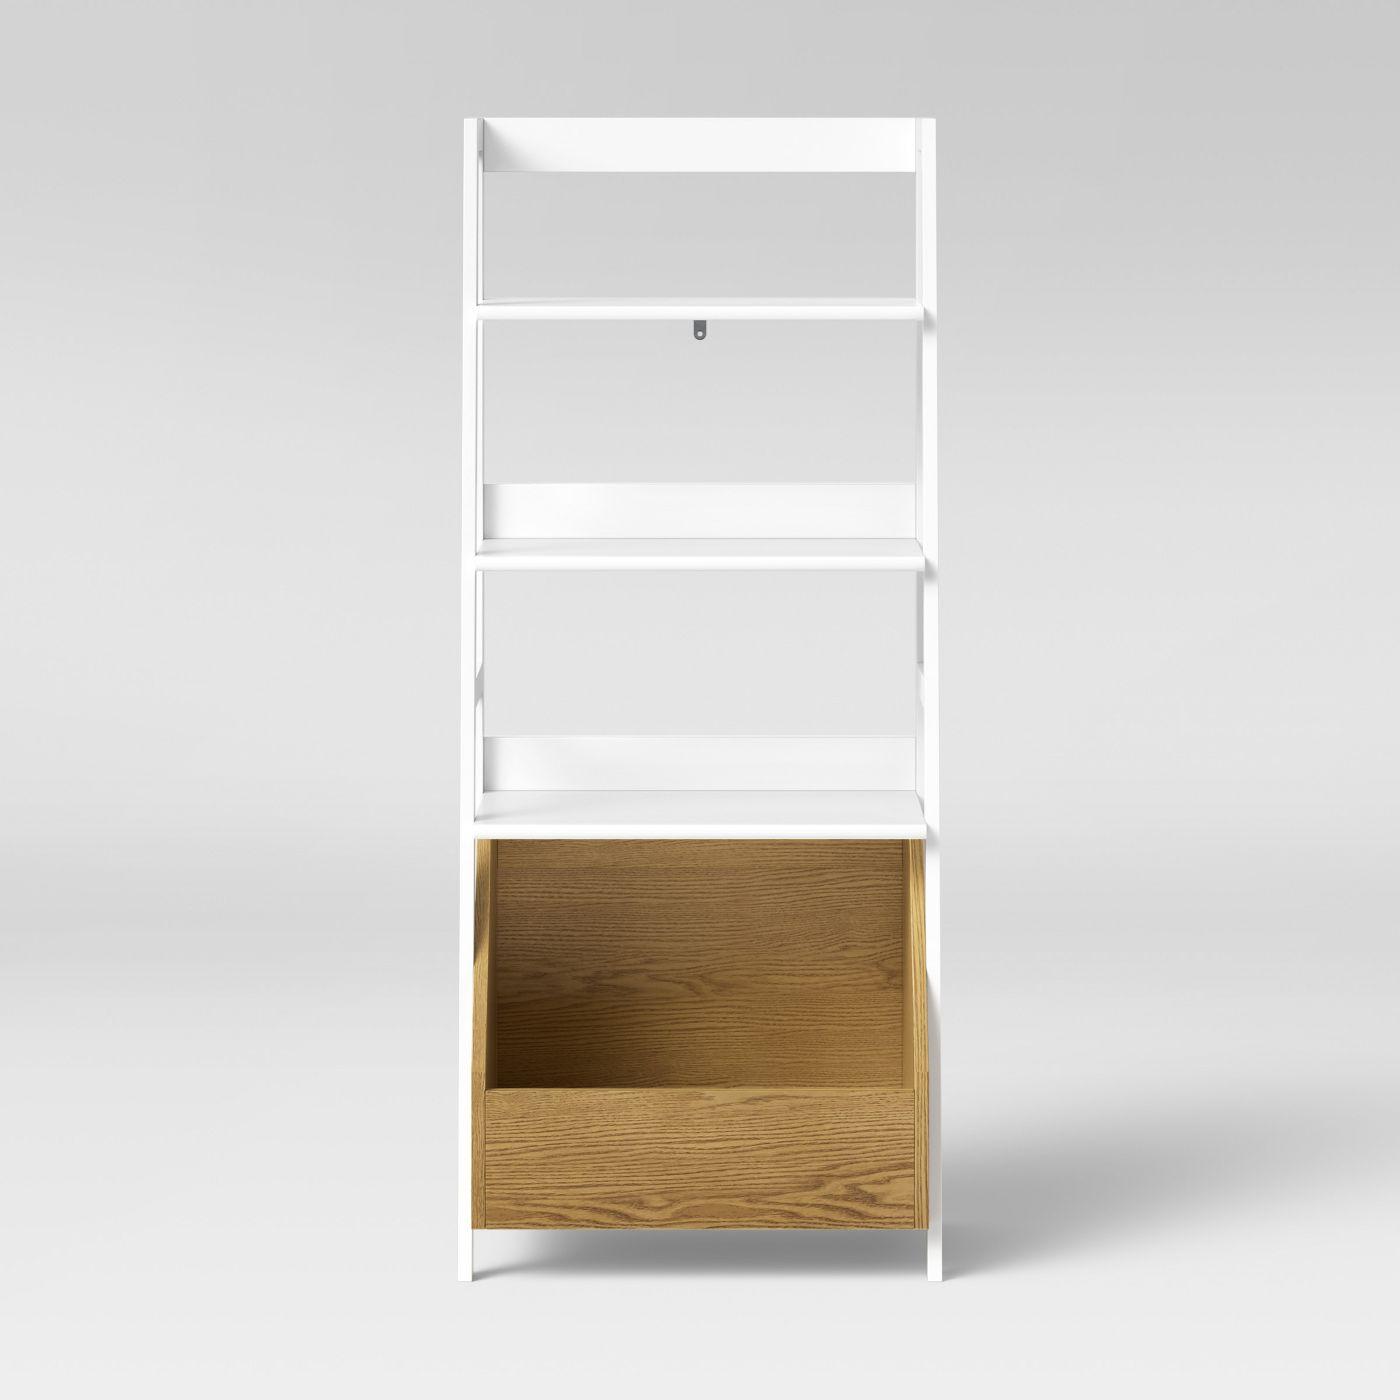 11 Kids' Book-Storage Finds That Go Beyond the Basic Shelf